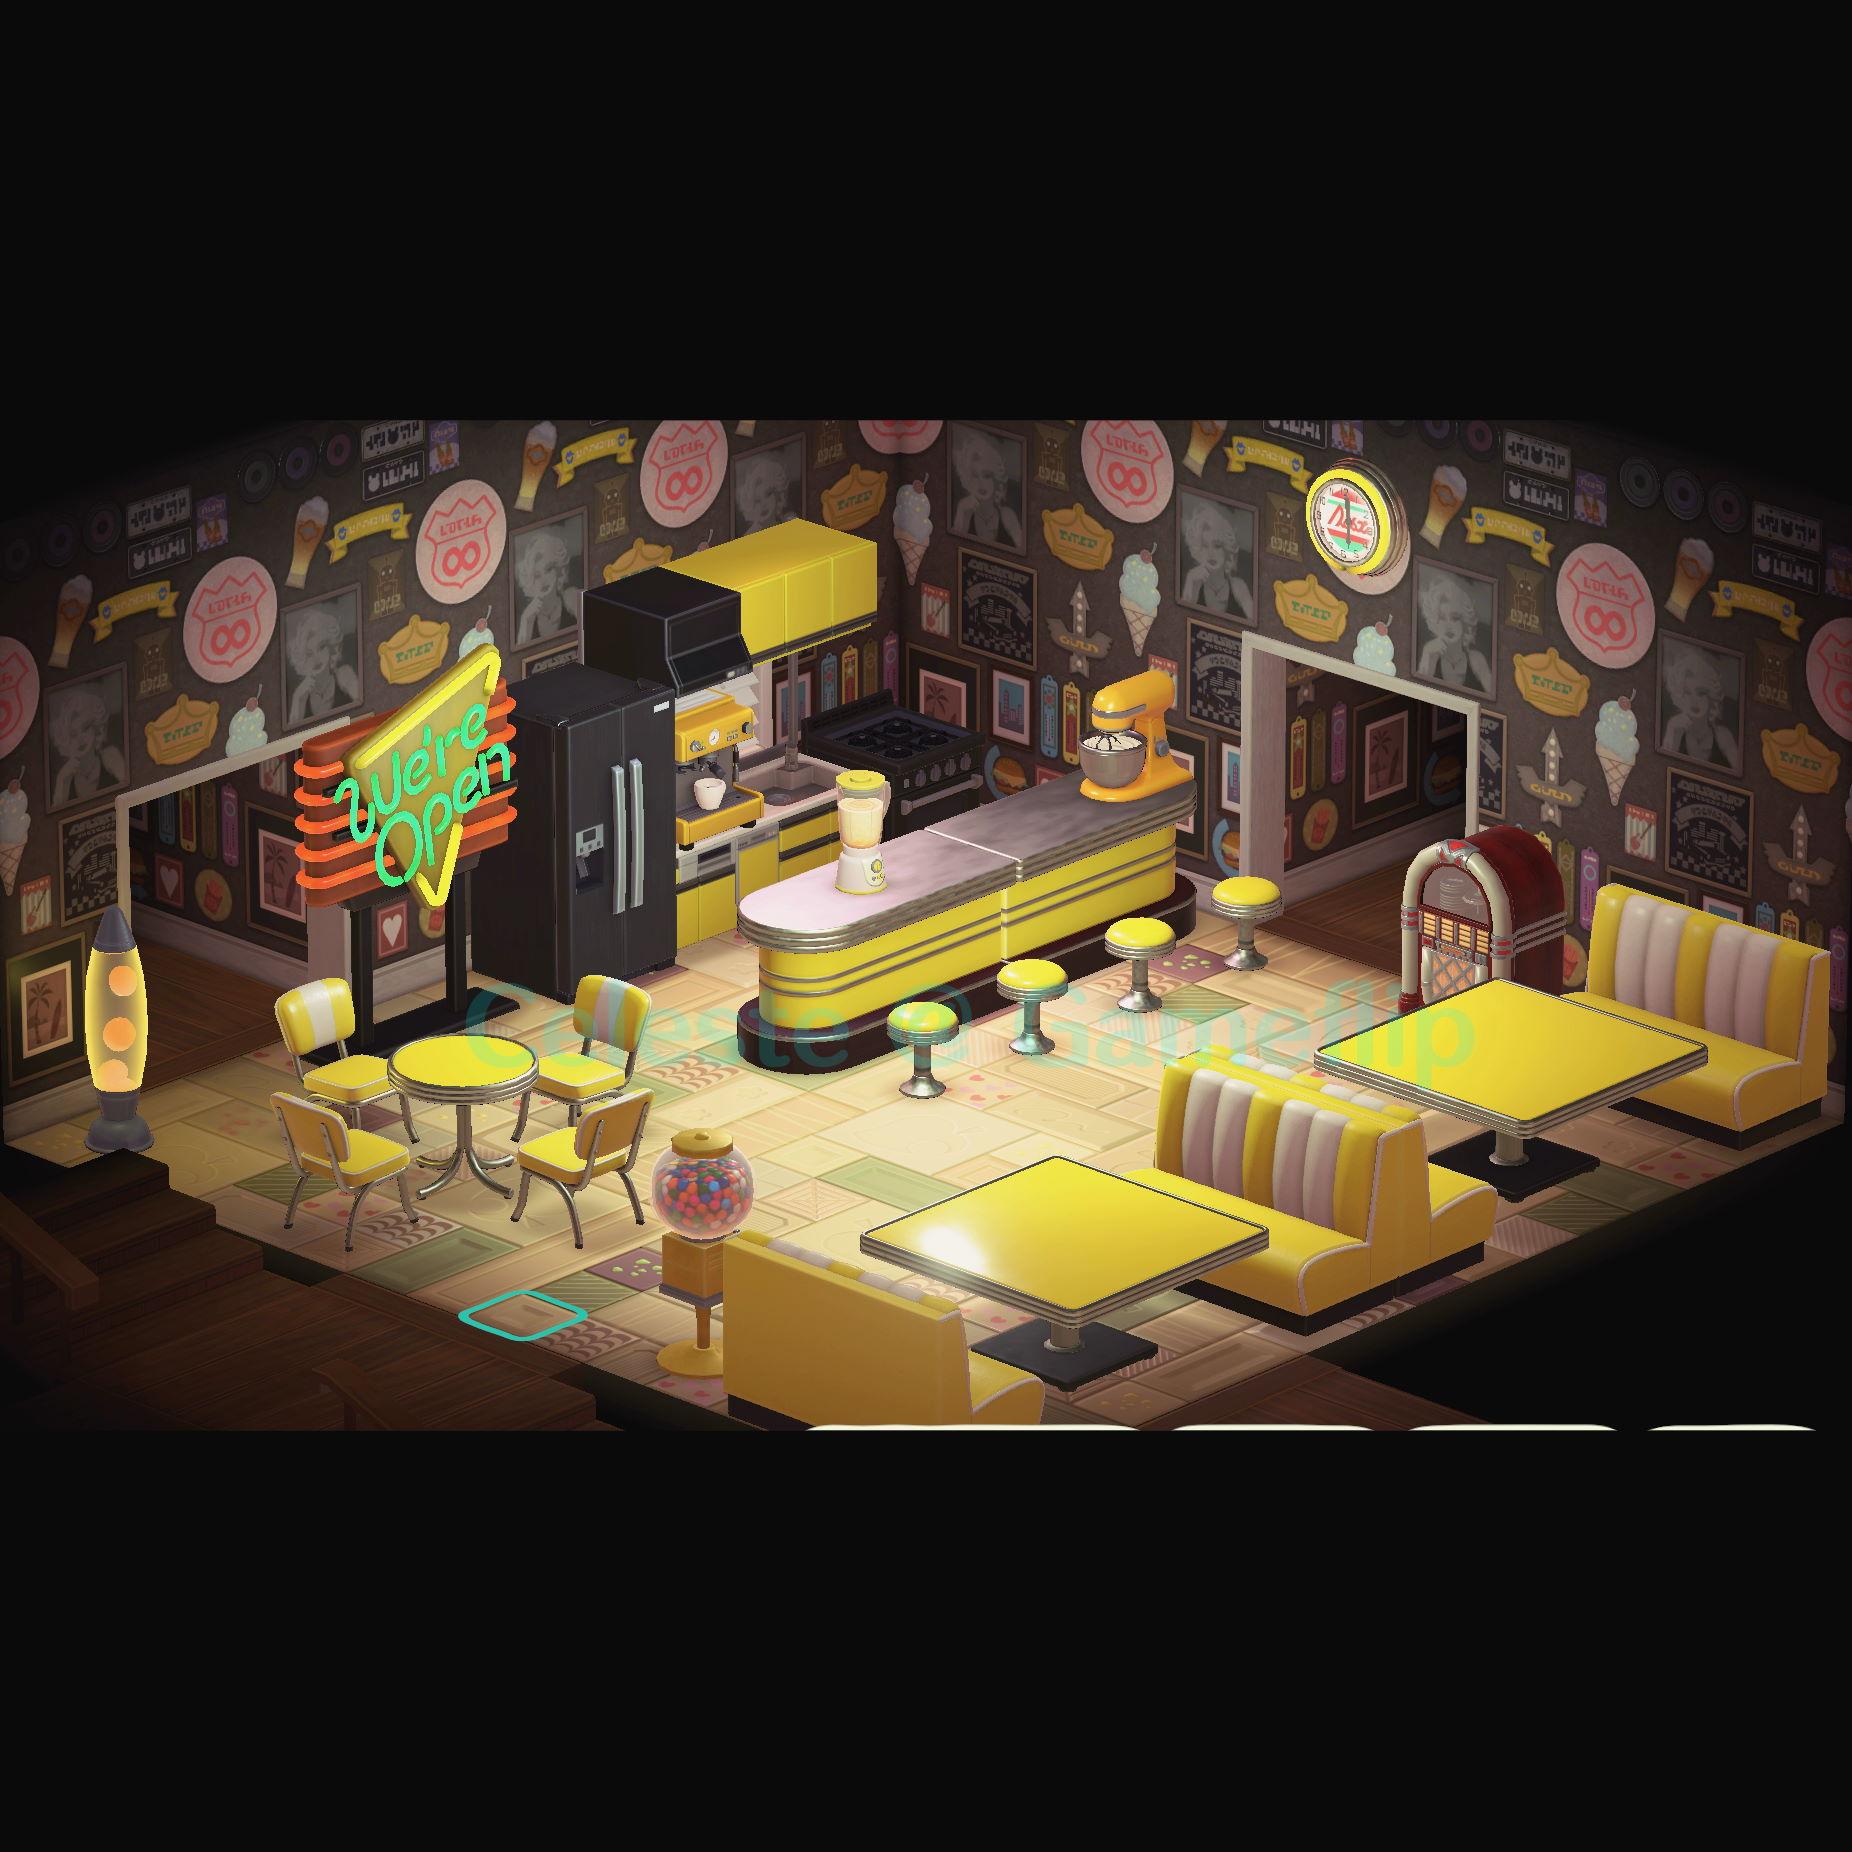 Furniture Yellow Diner Set In Game Items Gameflip